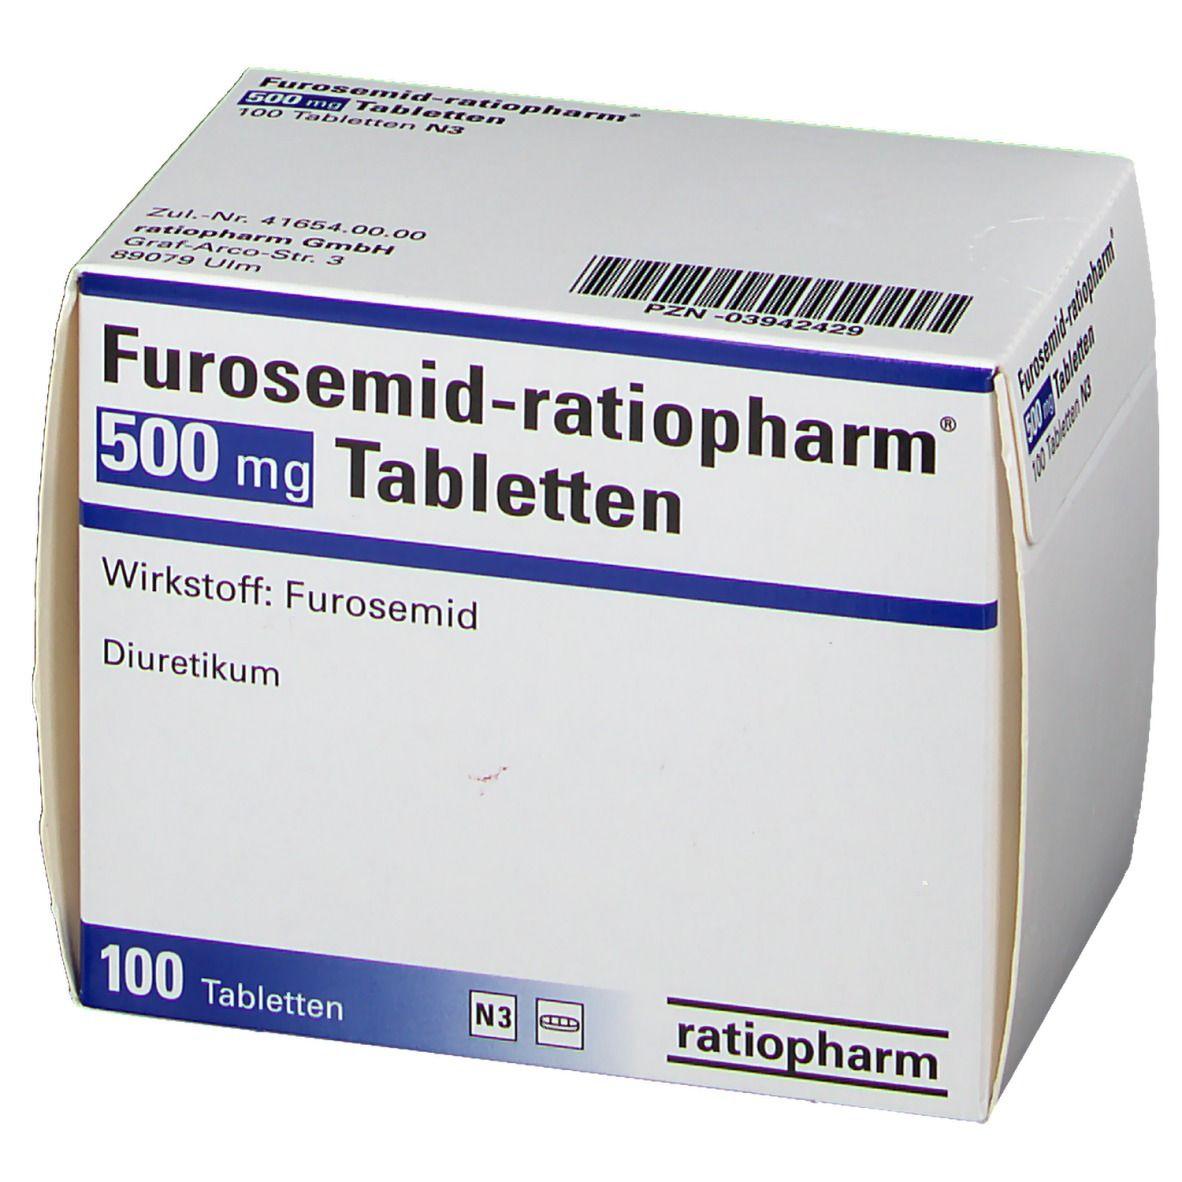 Furosemid ratiopharm 500 Tabl.